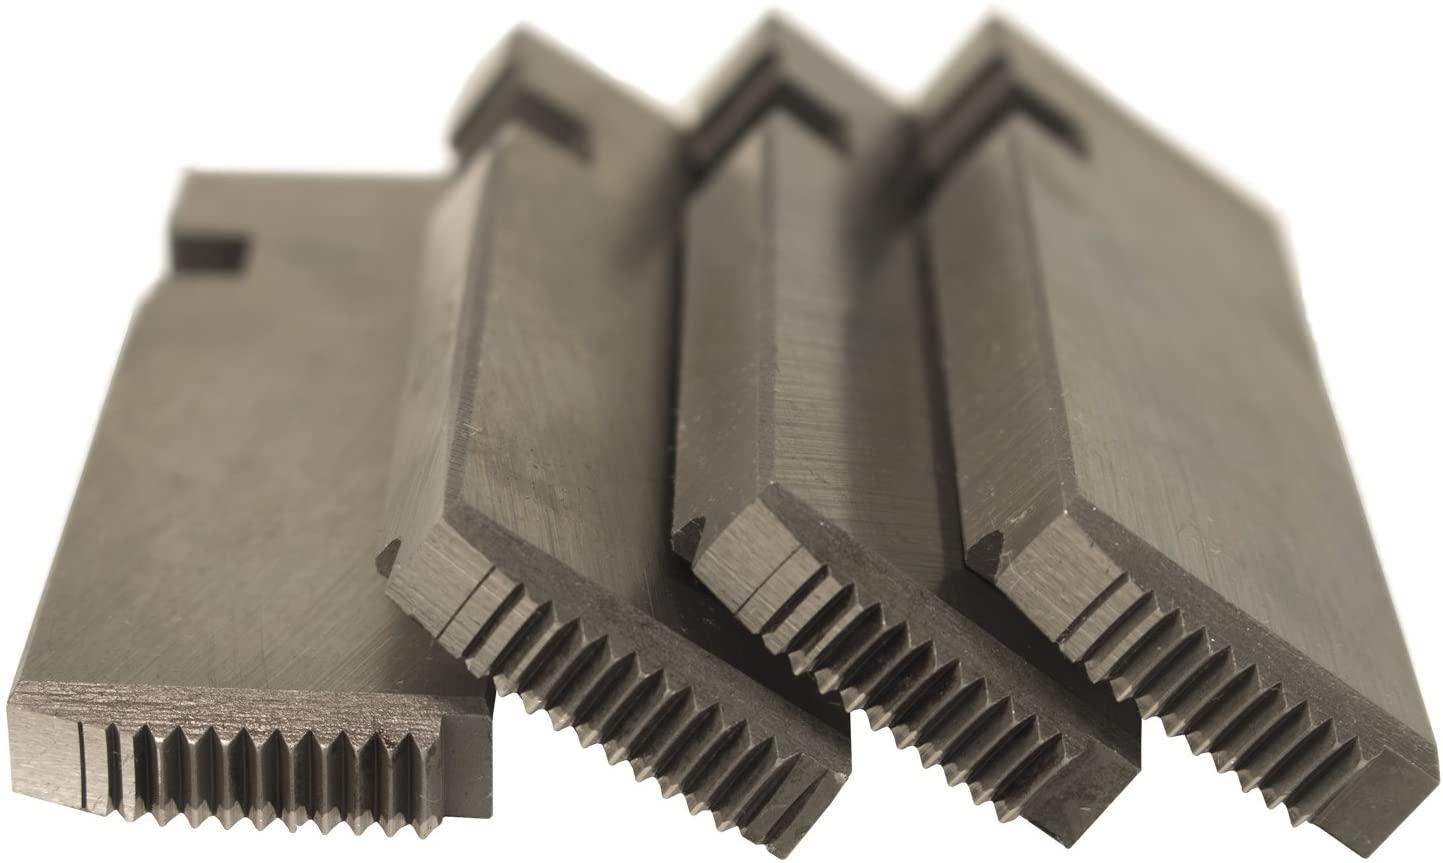 Steel Dragon Tools 47765 1/2in.-3/4in. HSS RH NPT Pipe Dies fits RIDGID 811A 815A